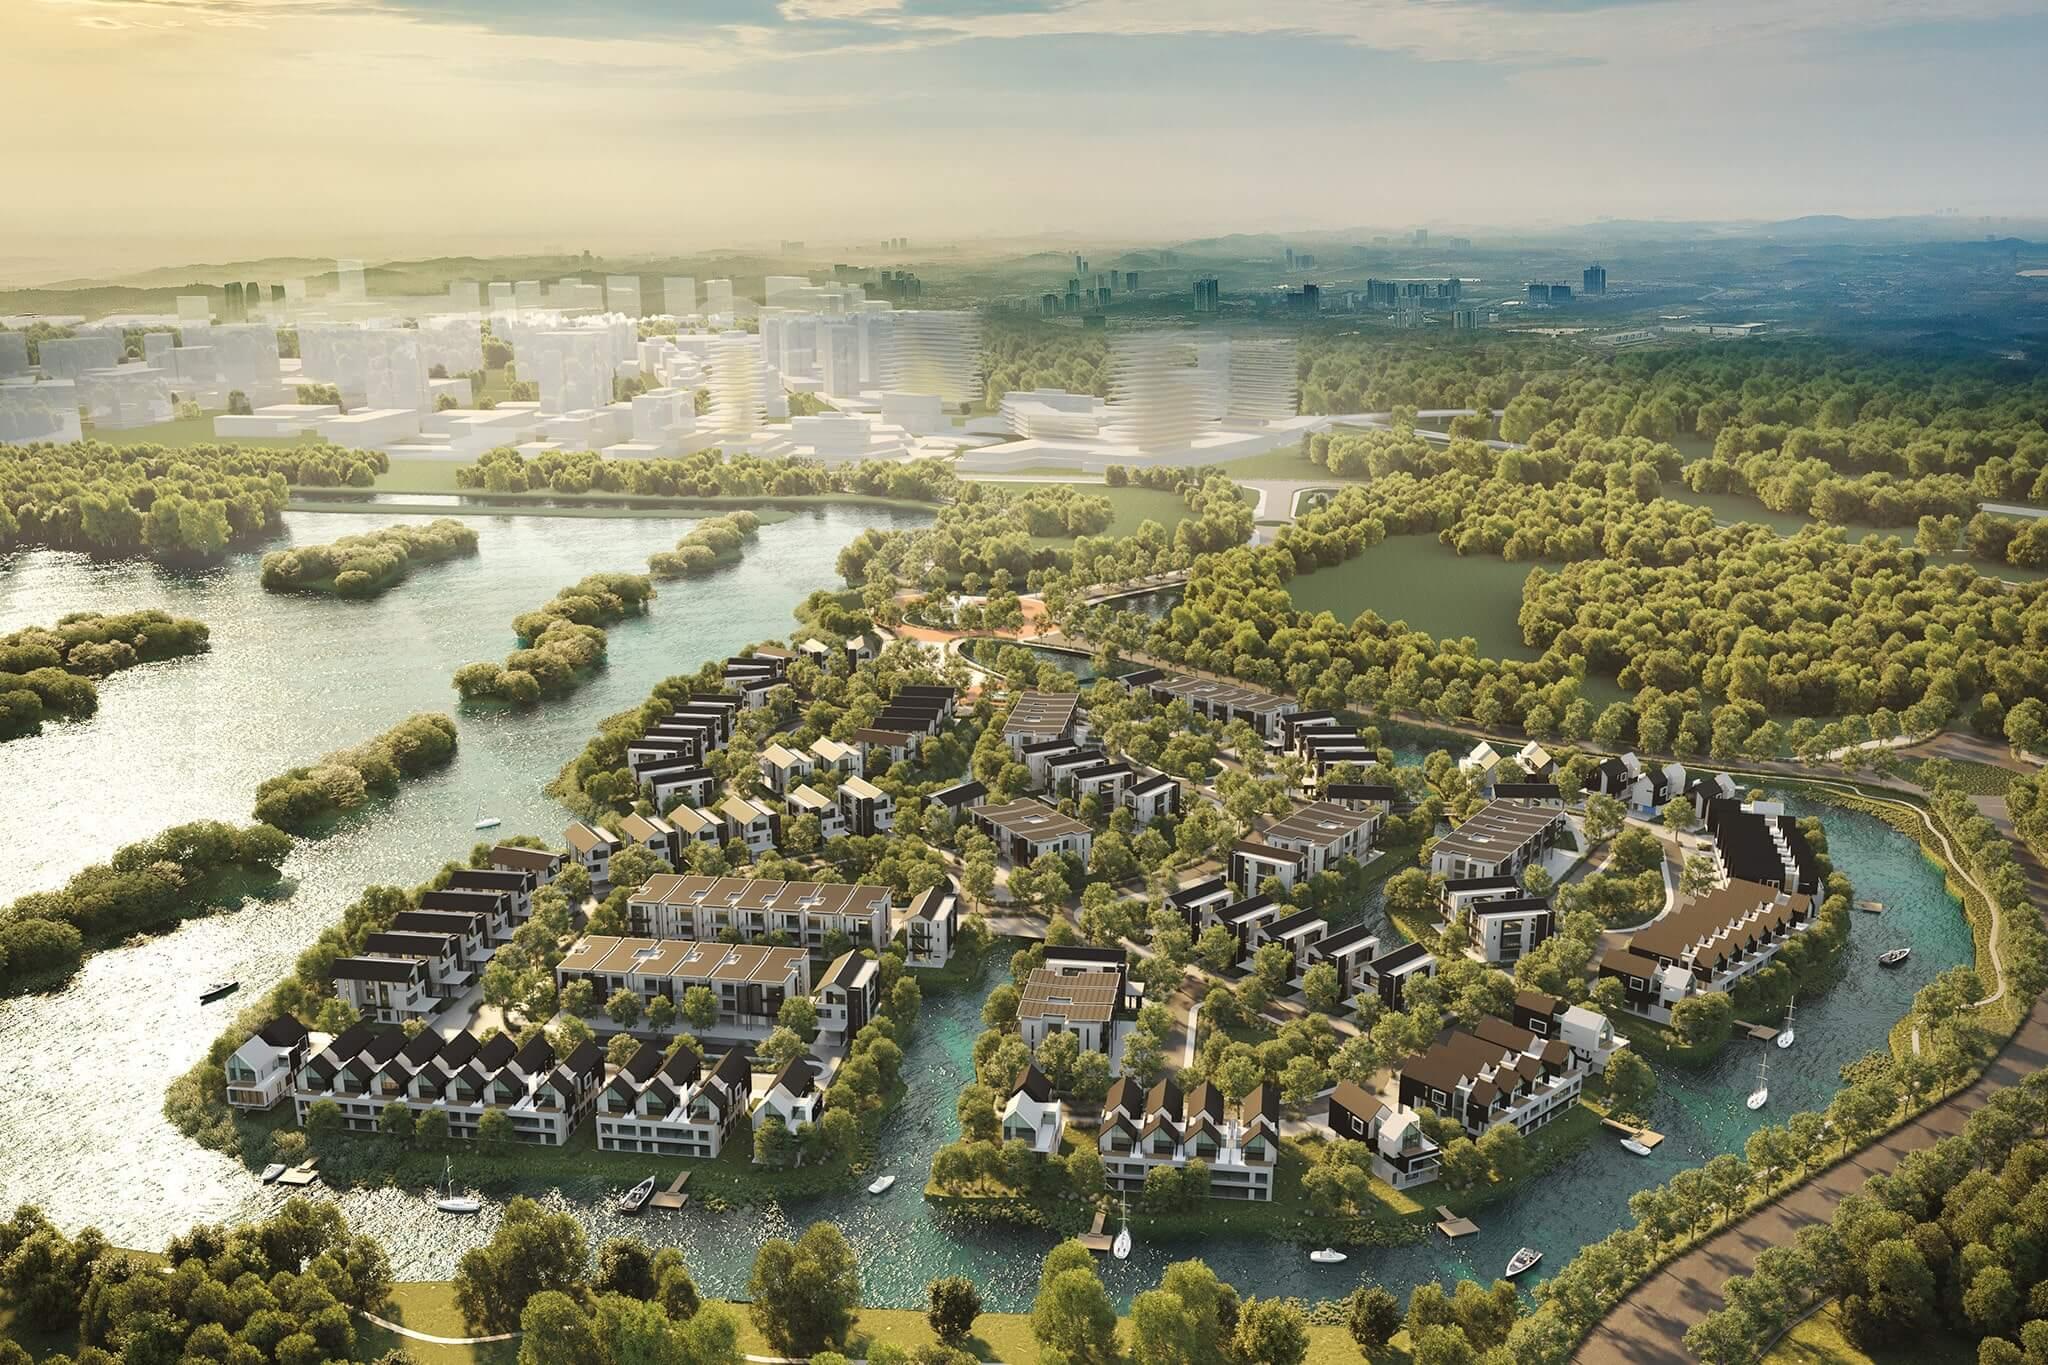 waterfront estates aerial view